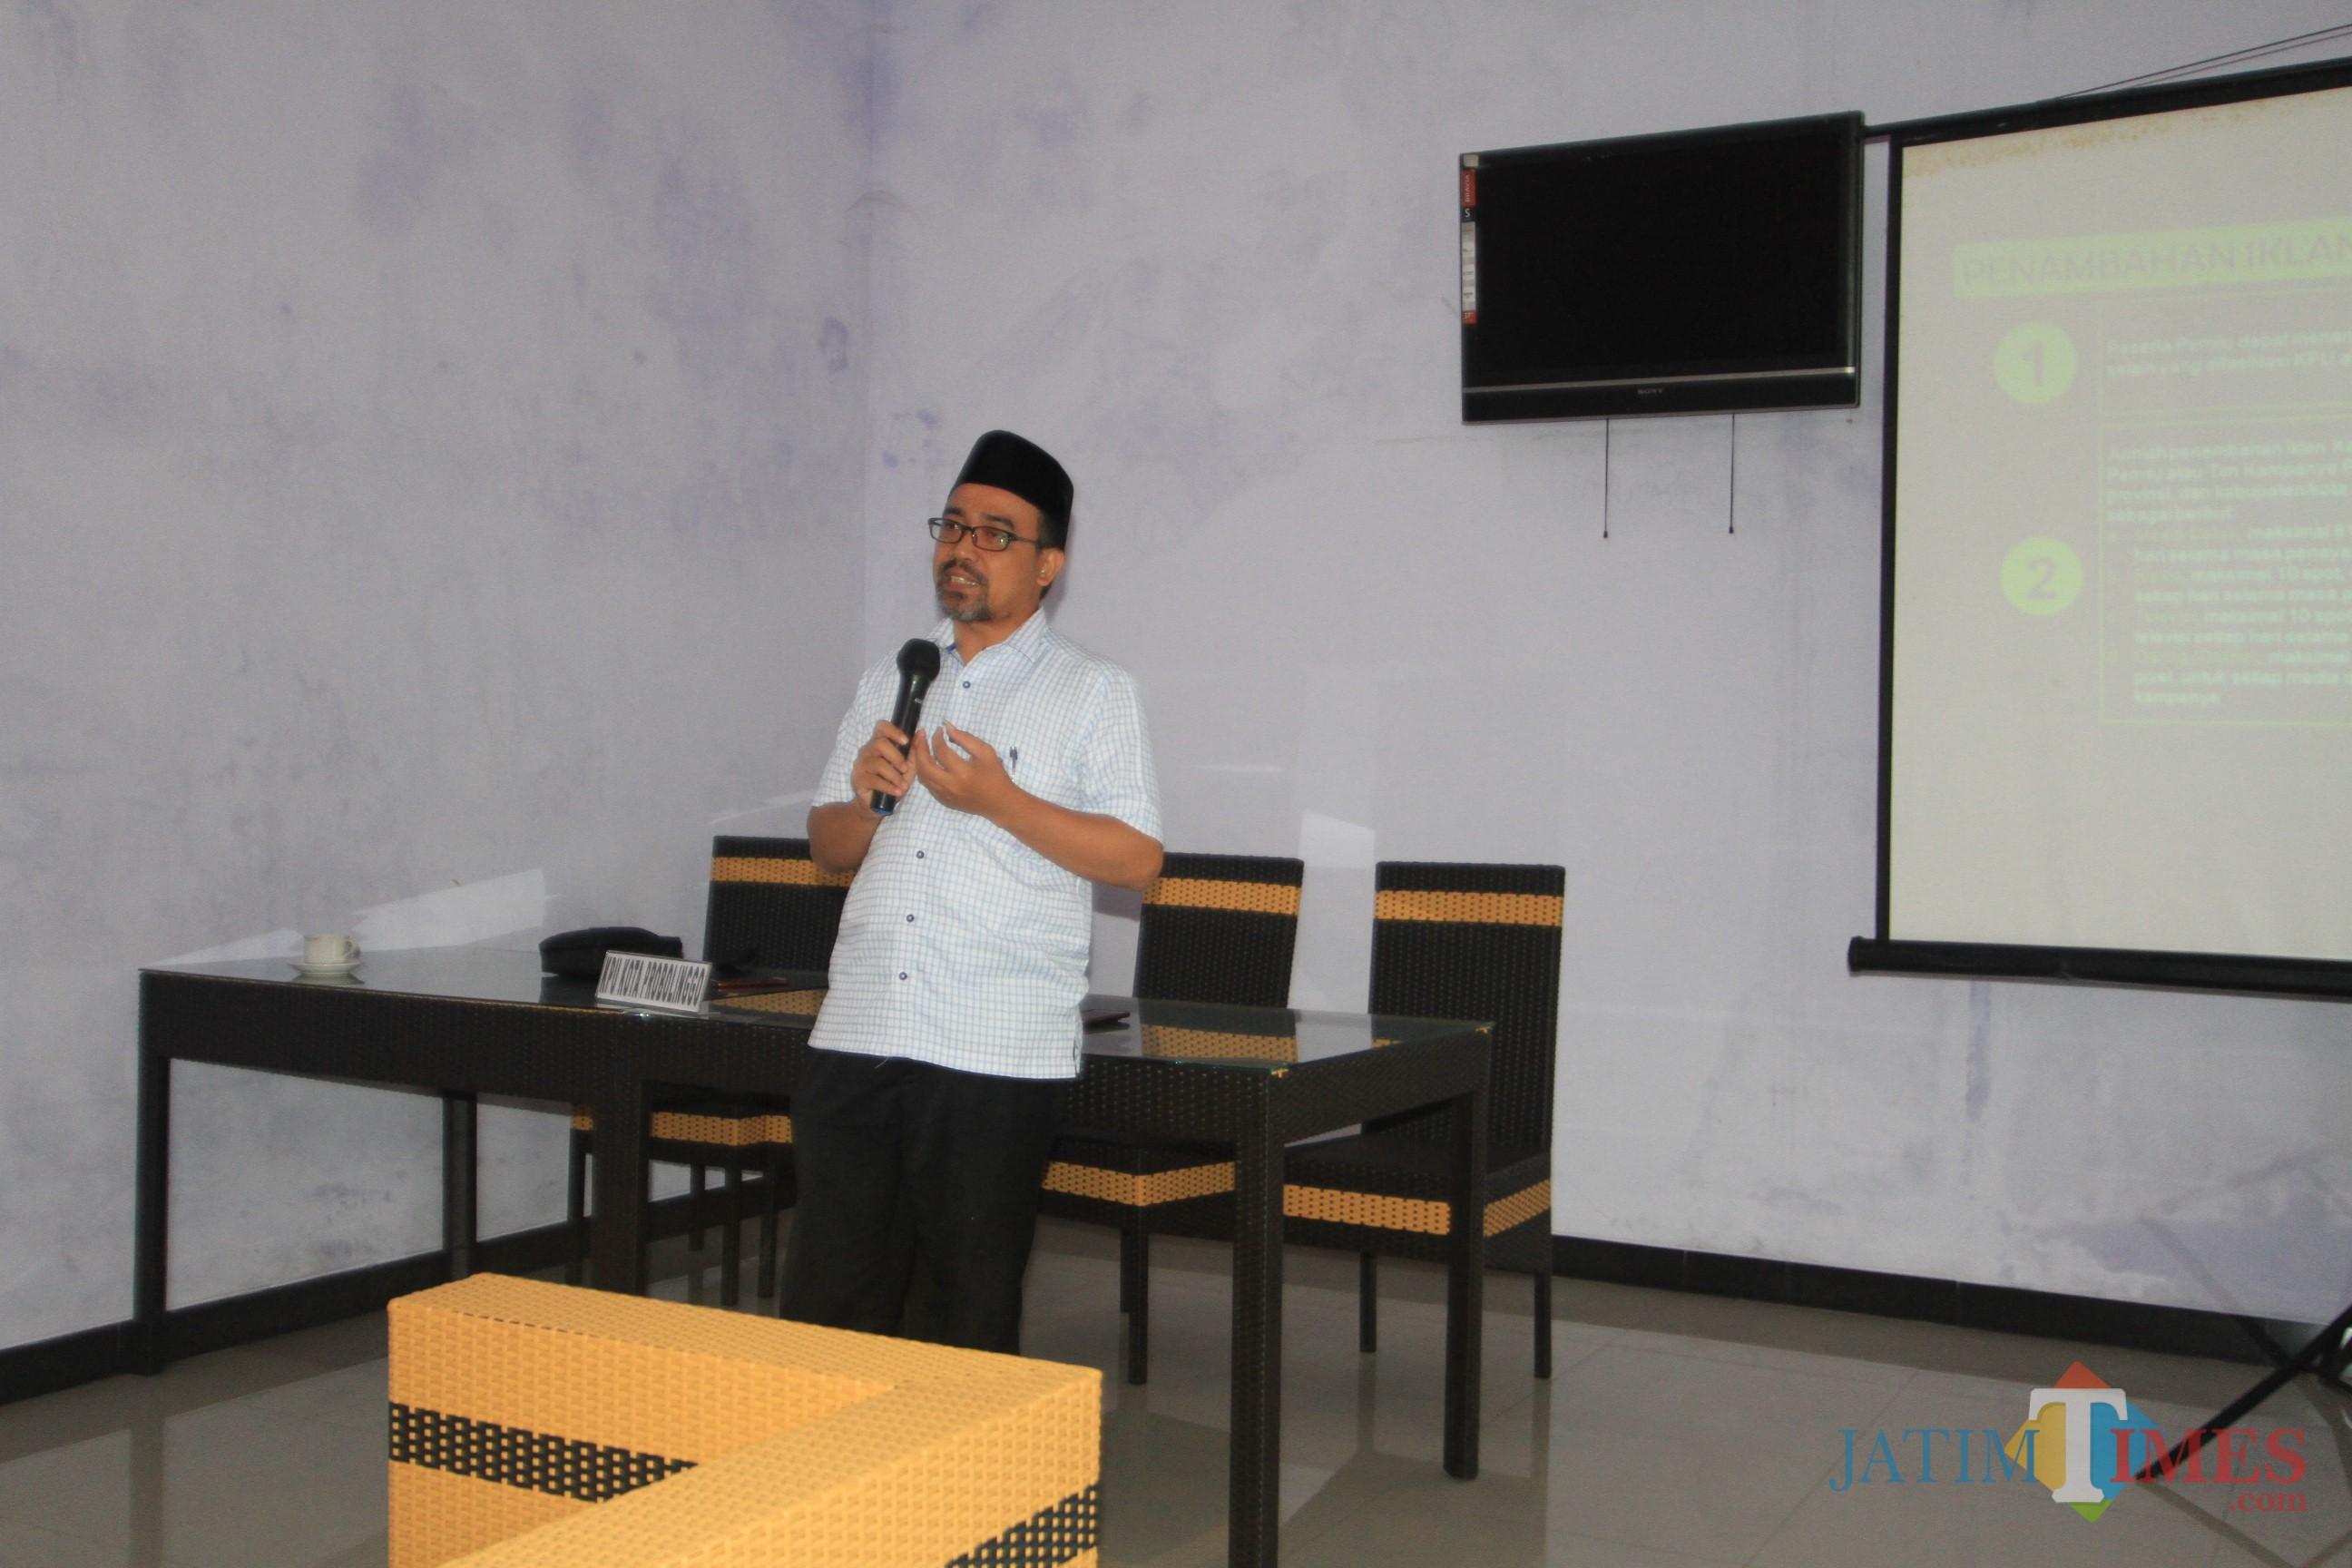 ketua KPU Ahmad Hudri saat acara gathering dengan Bawaslu dan Media  (Agus Salam/Jatim TIMES)